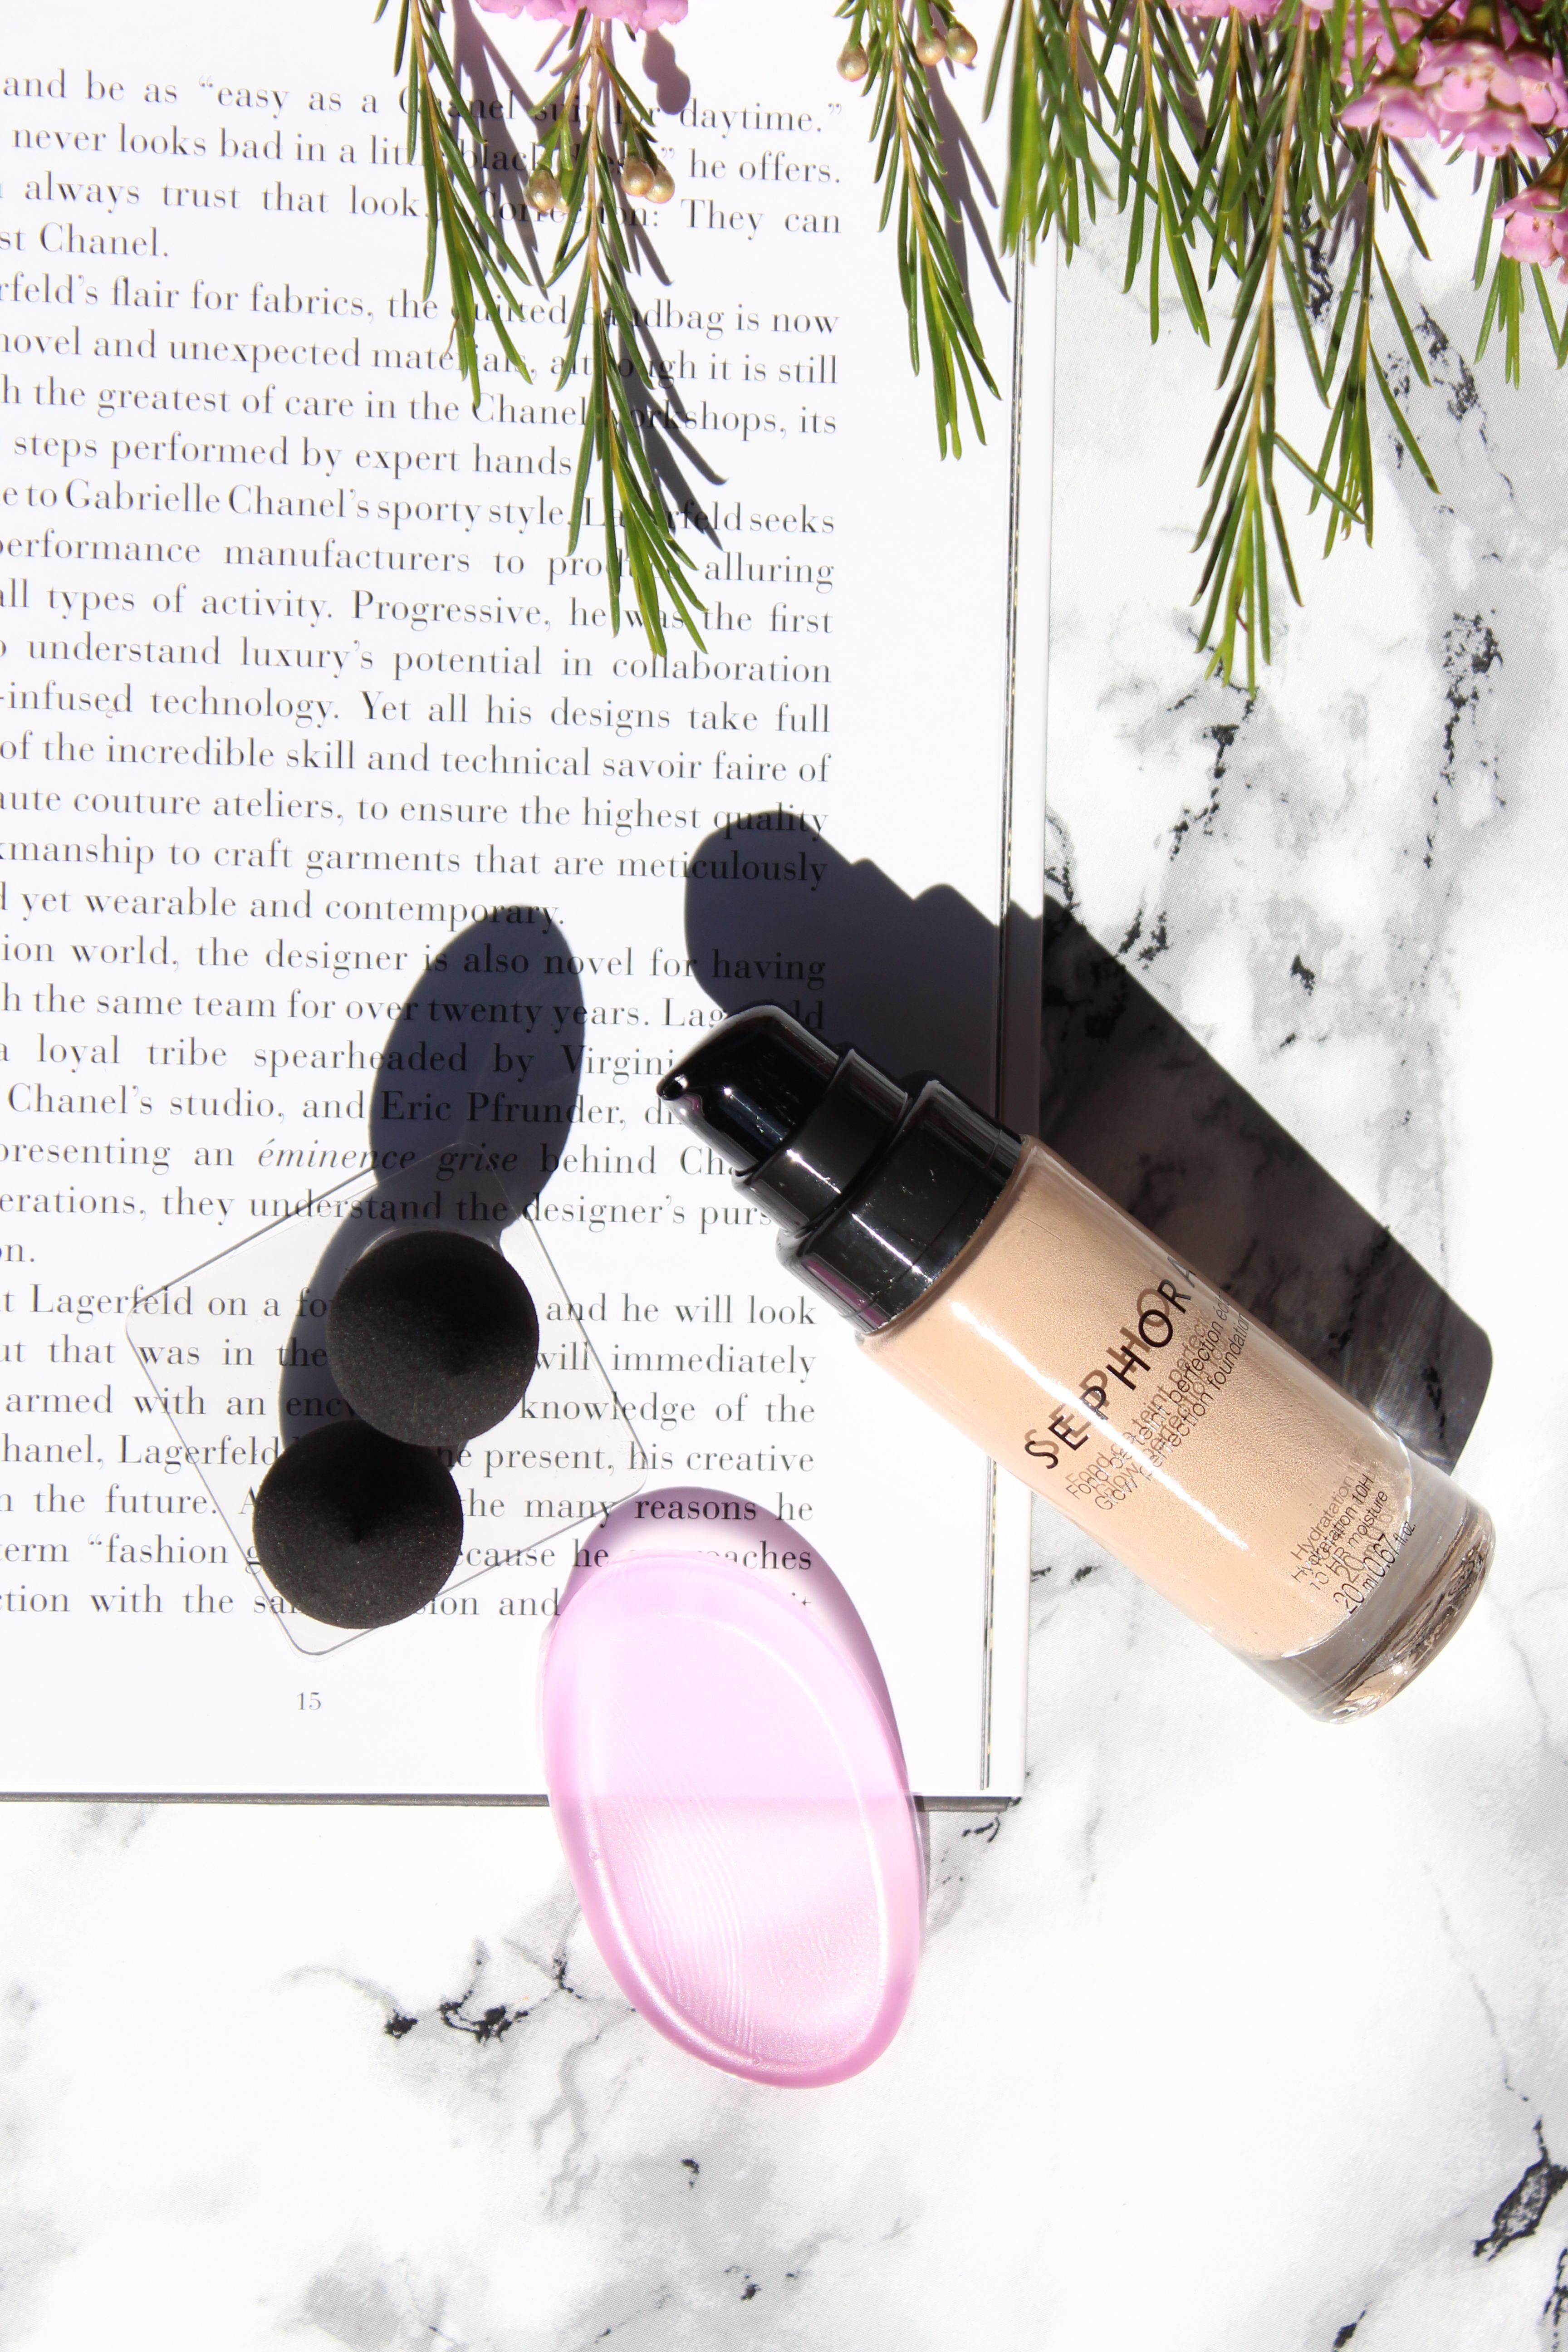 Sephora FrühlingsNeuheiten 2018 Dekorative kosmetik